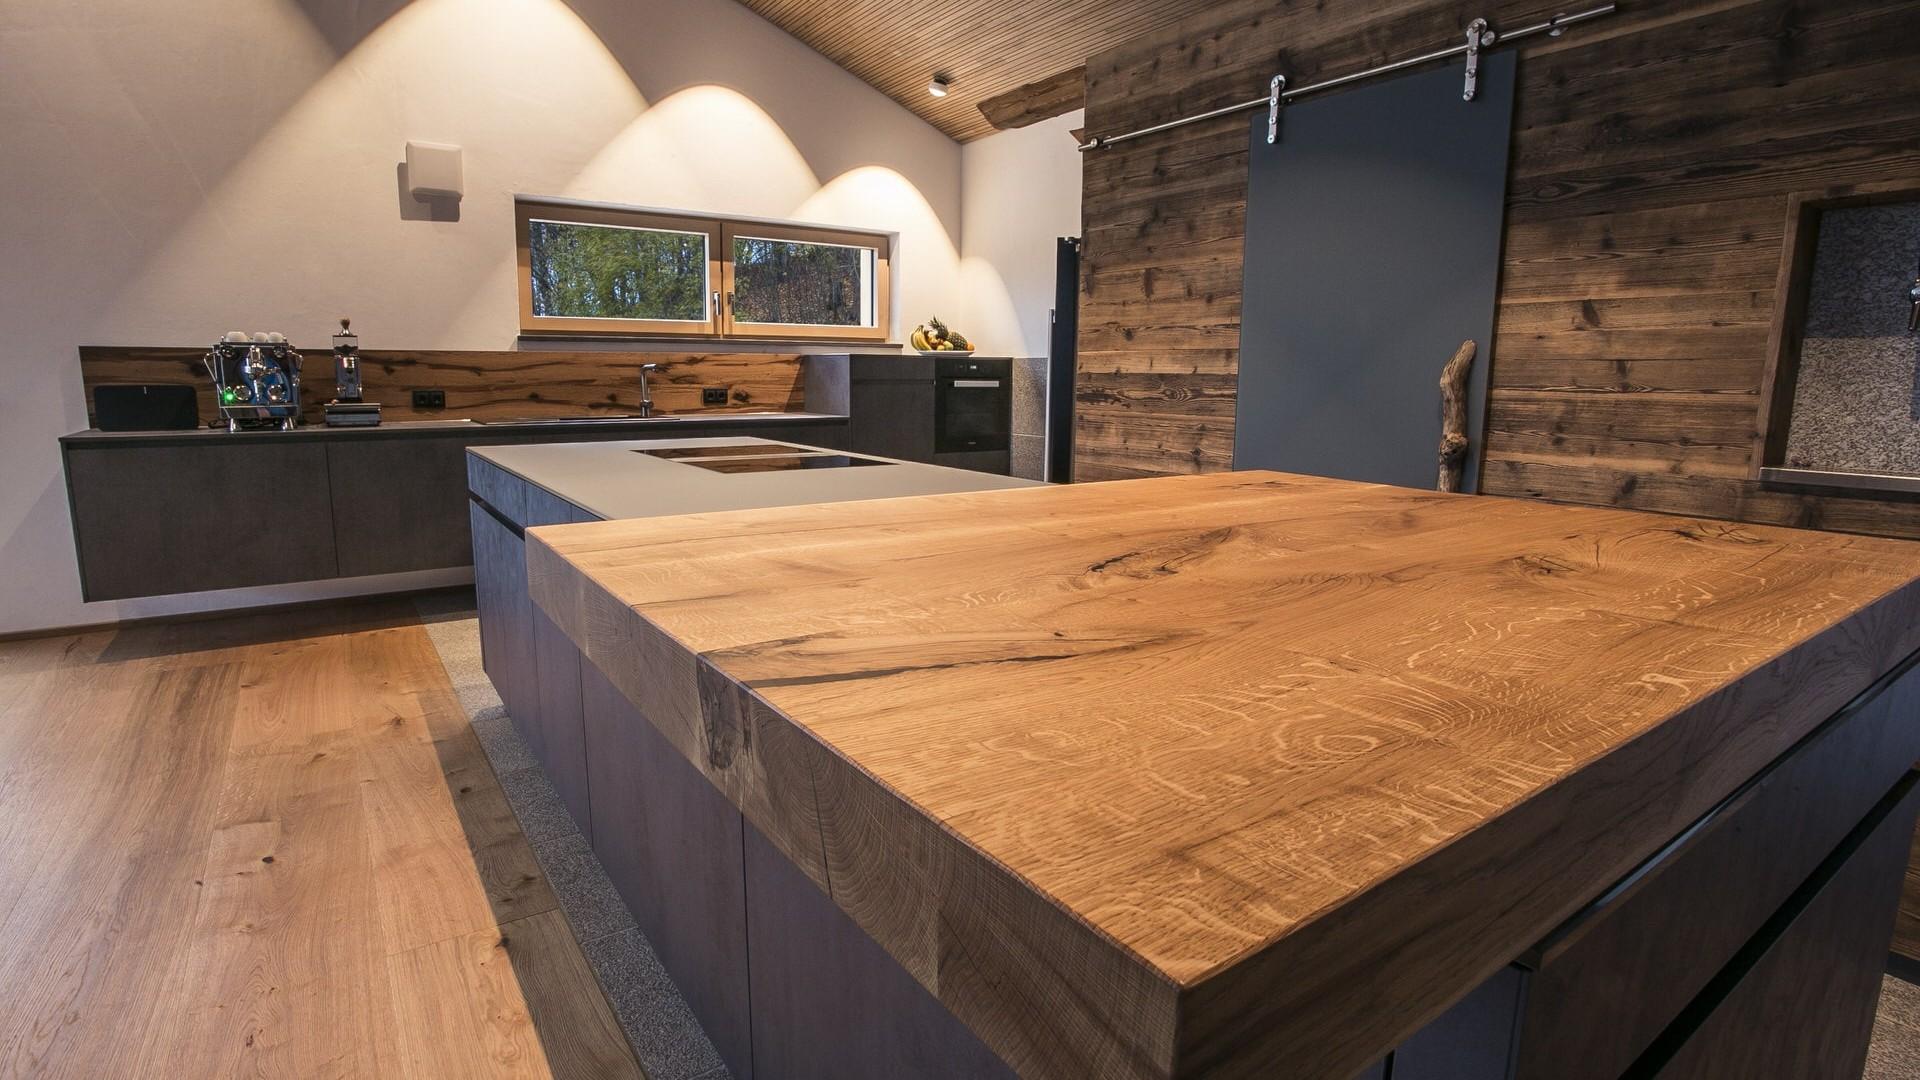 Kuchen Betonoptik Und Holz – Caseconrad.com